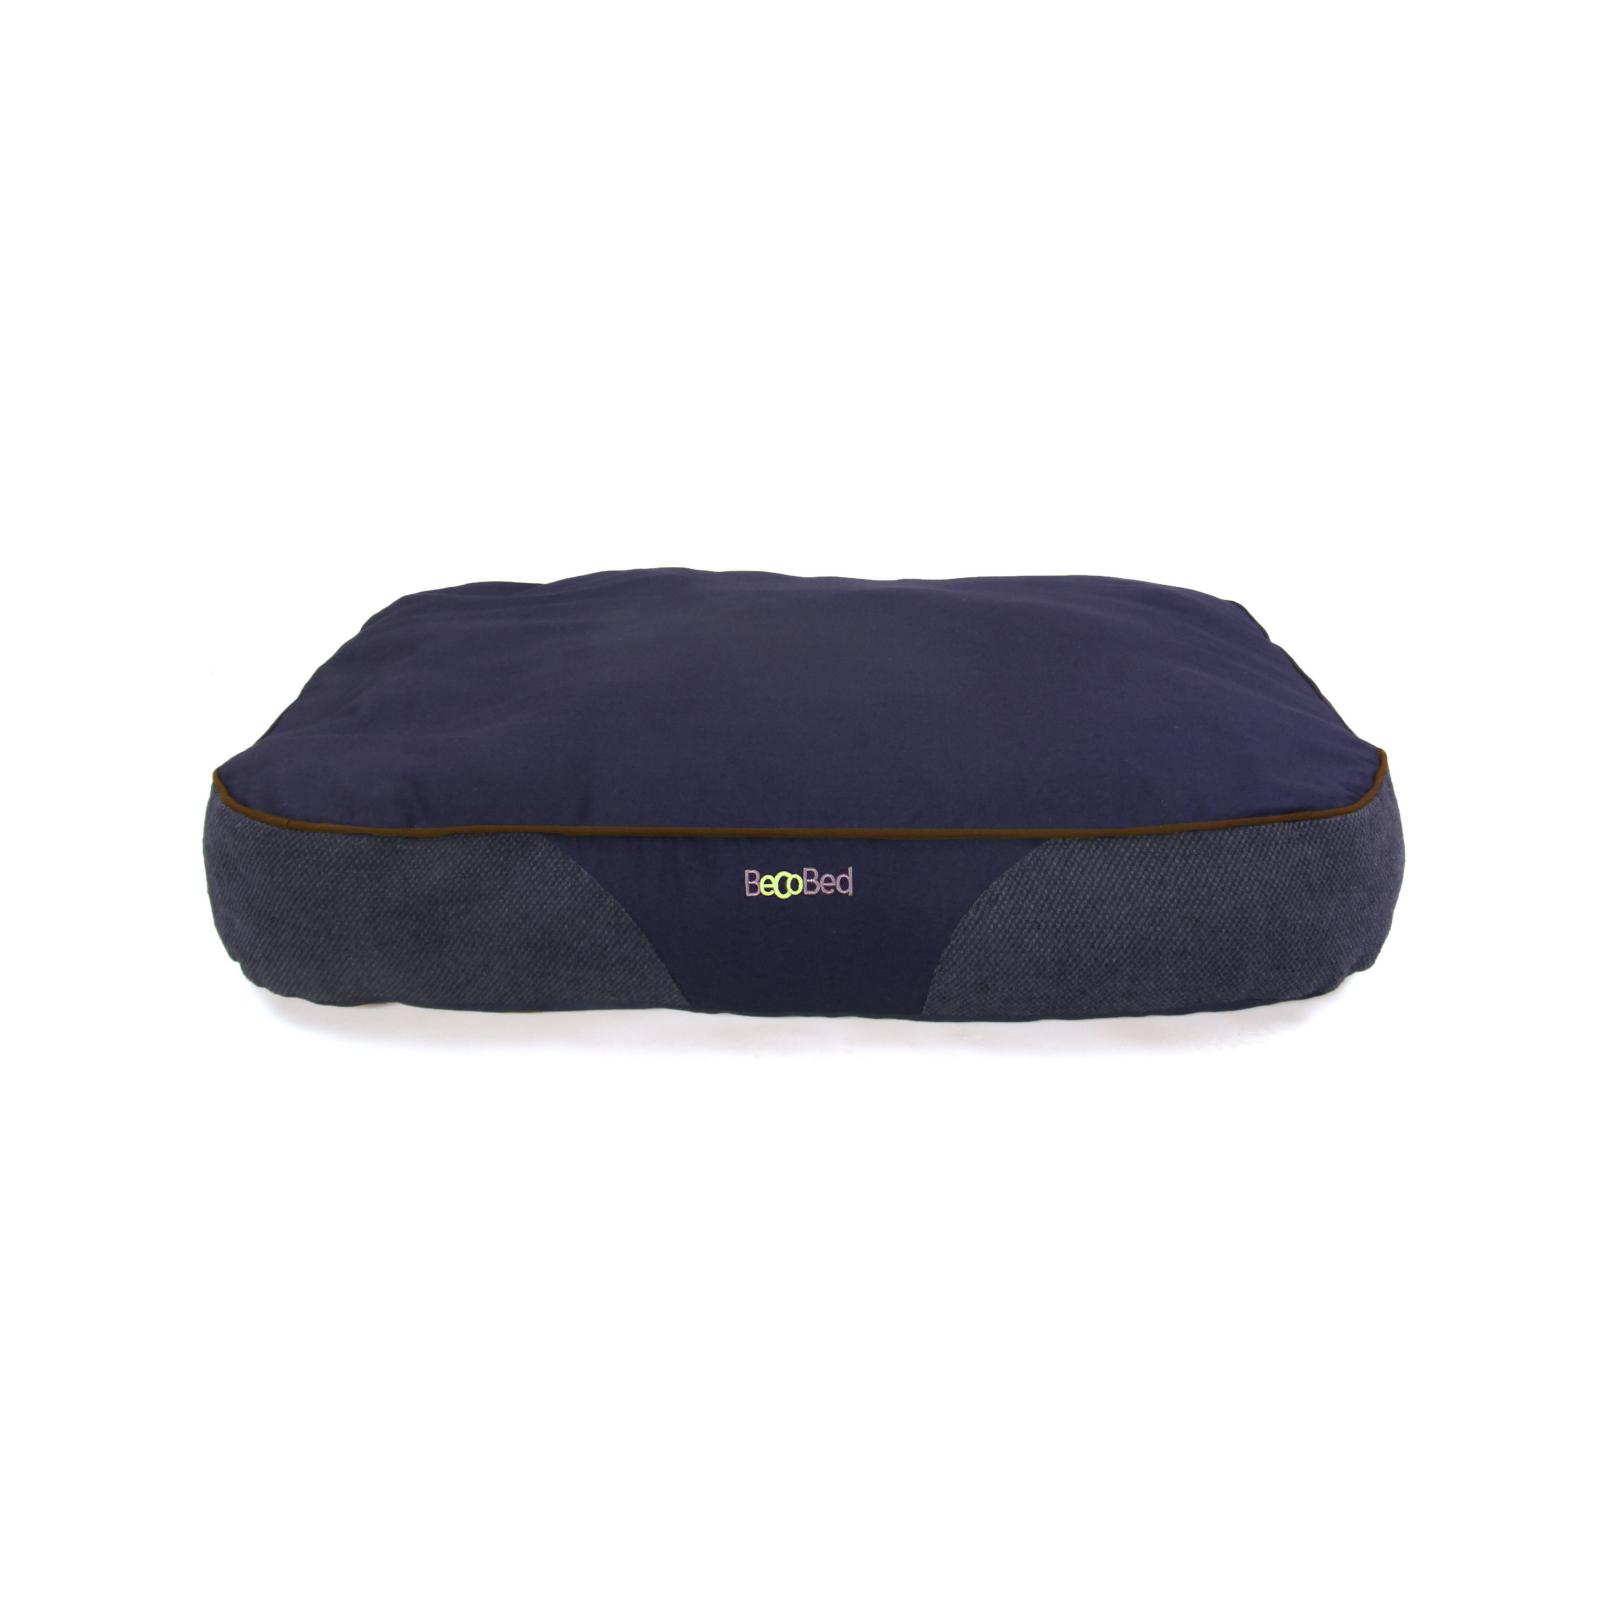 Beco Pets Beco Bed Mattress Large 1 ks, modrá